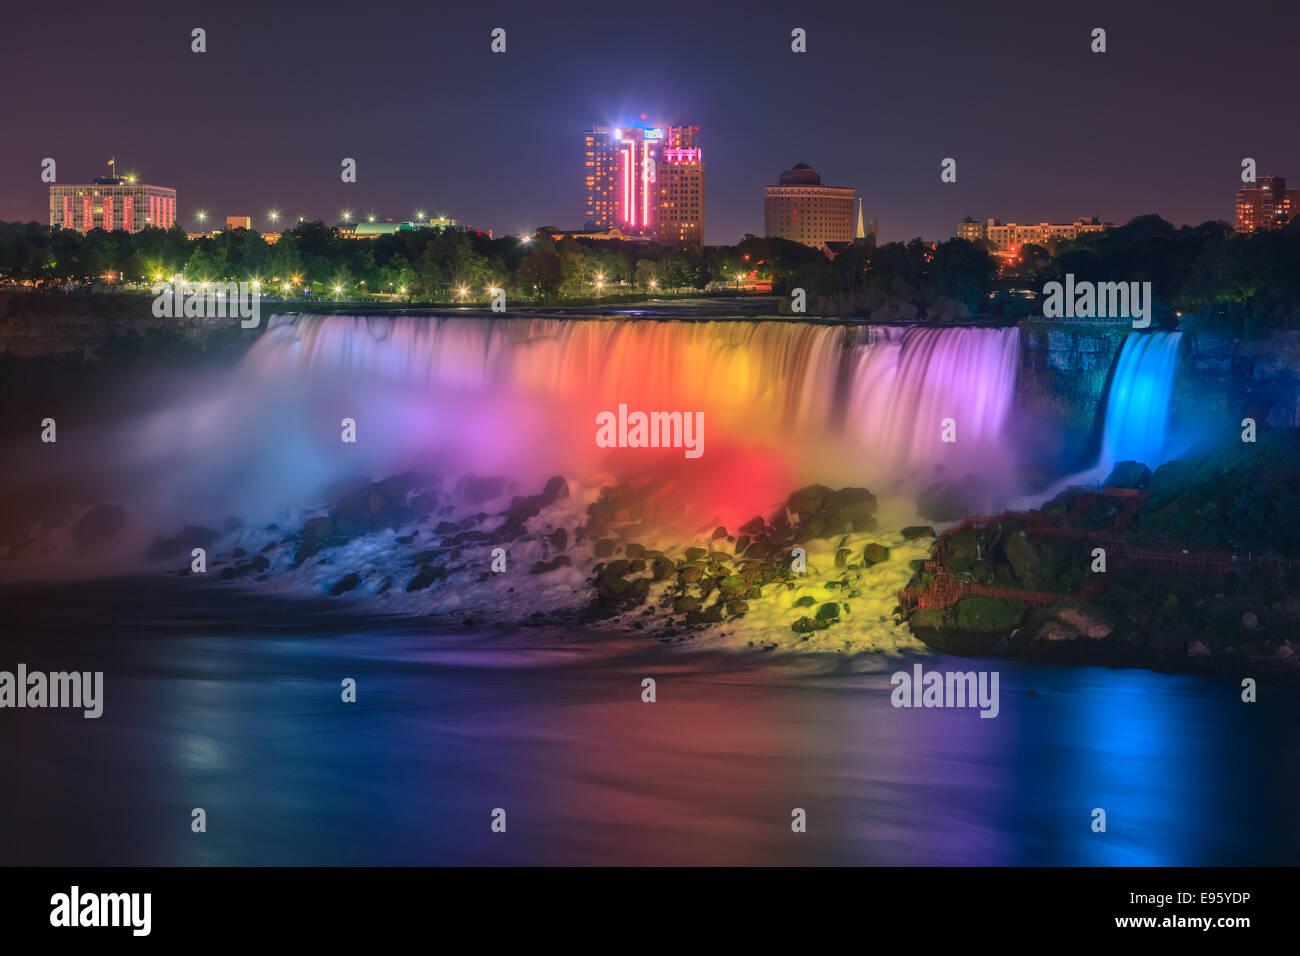 Licht-Show an den American Falls, Teil von Niagara Falls, Ontario, Kanada. Stockbild